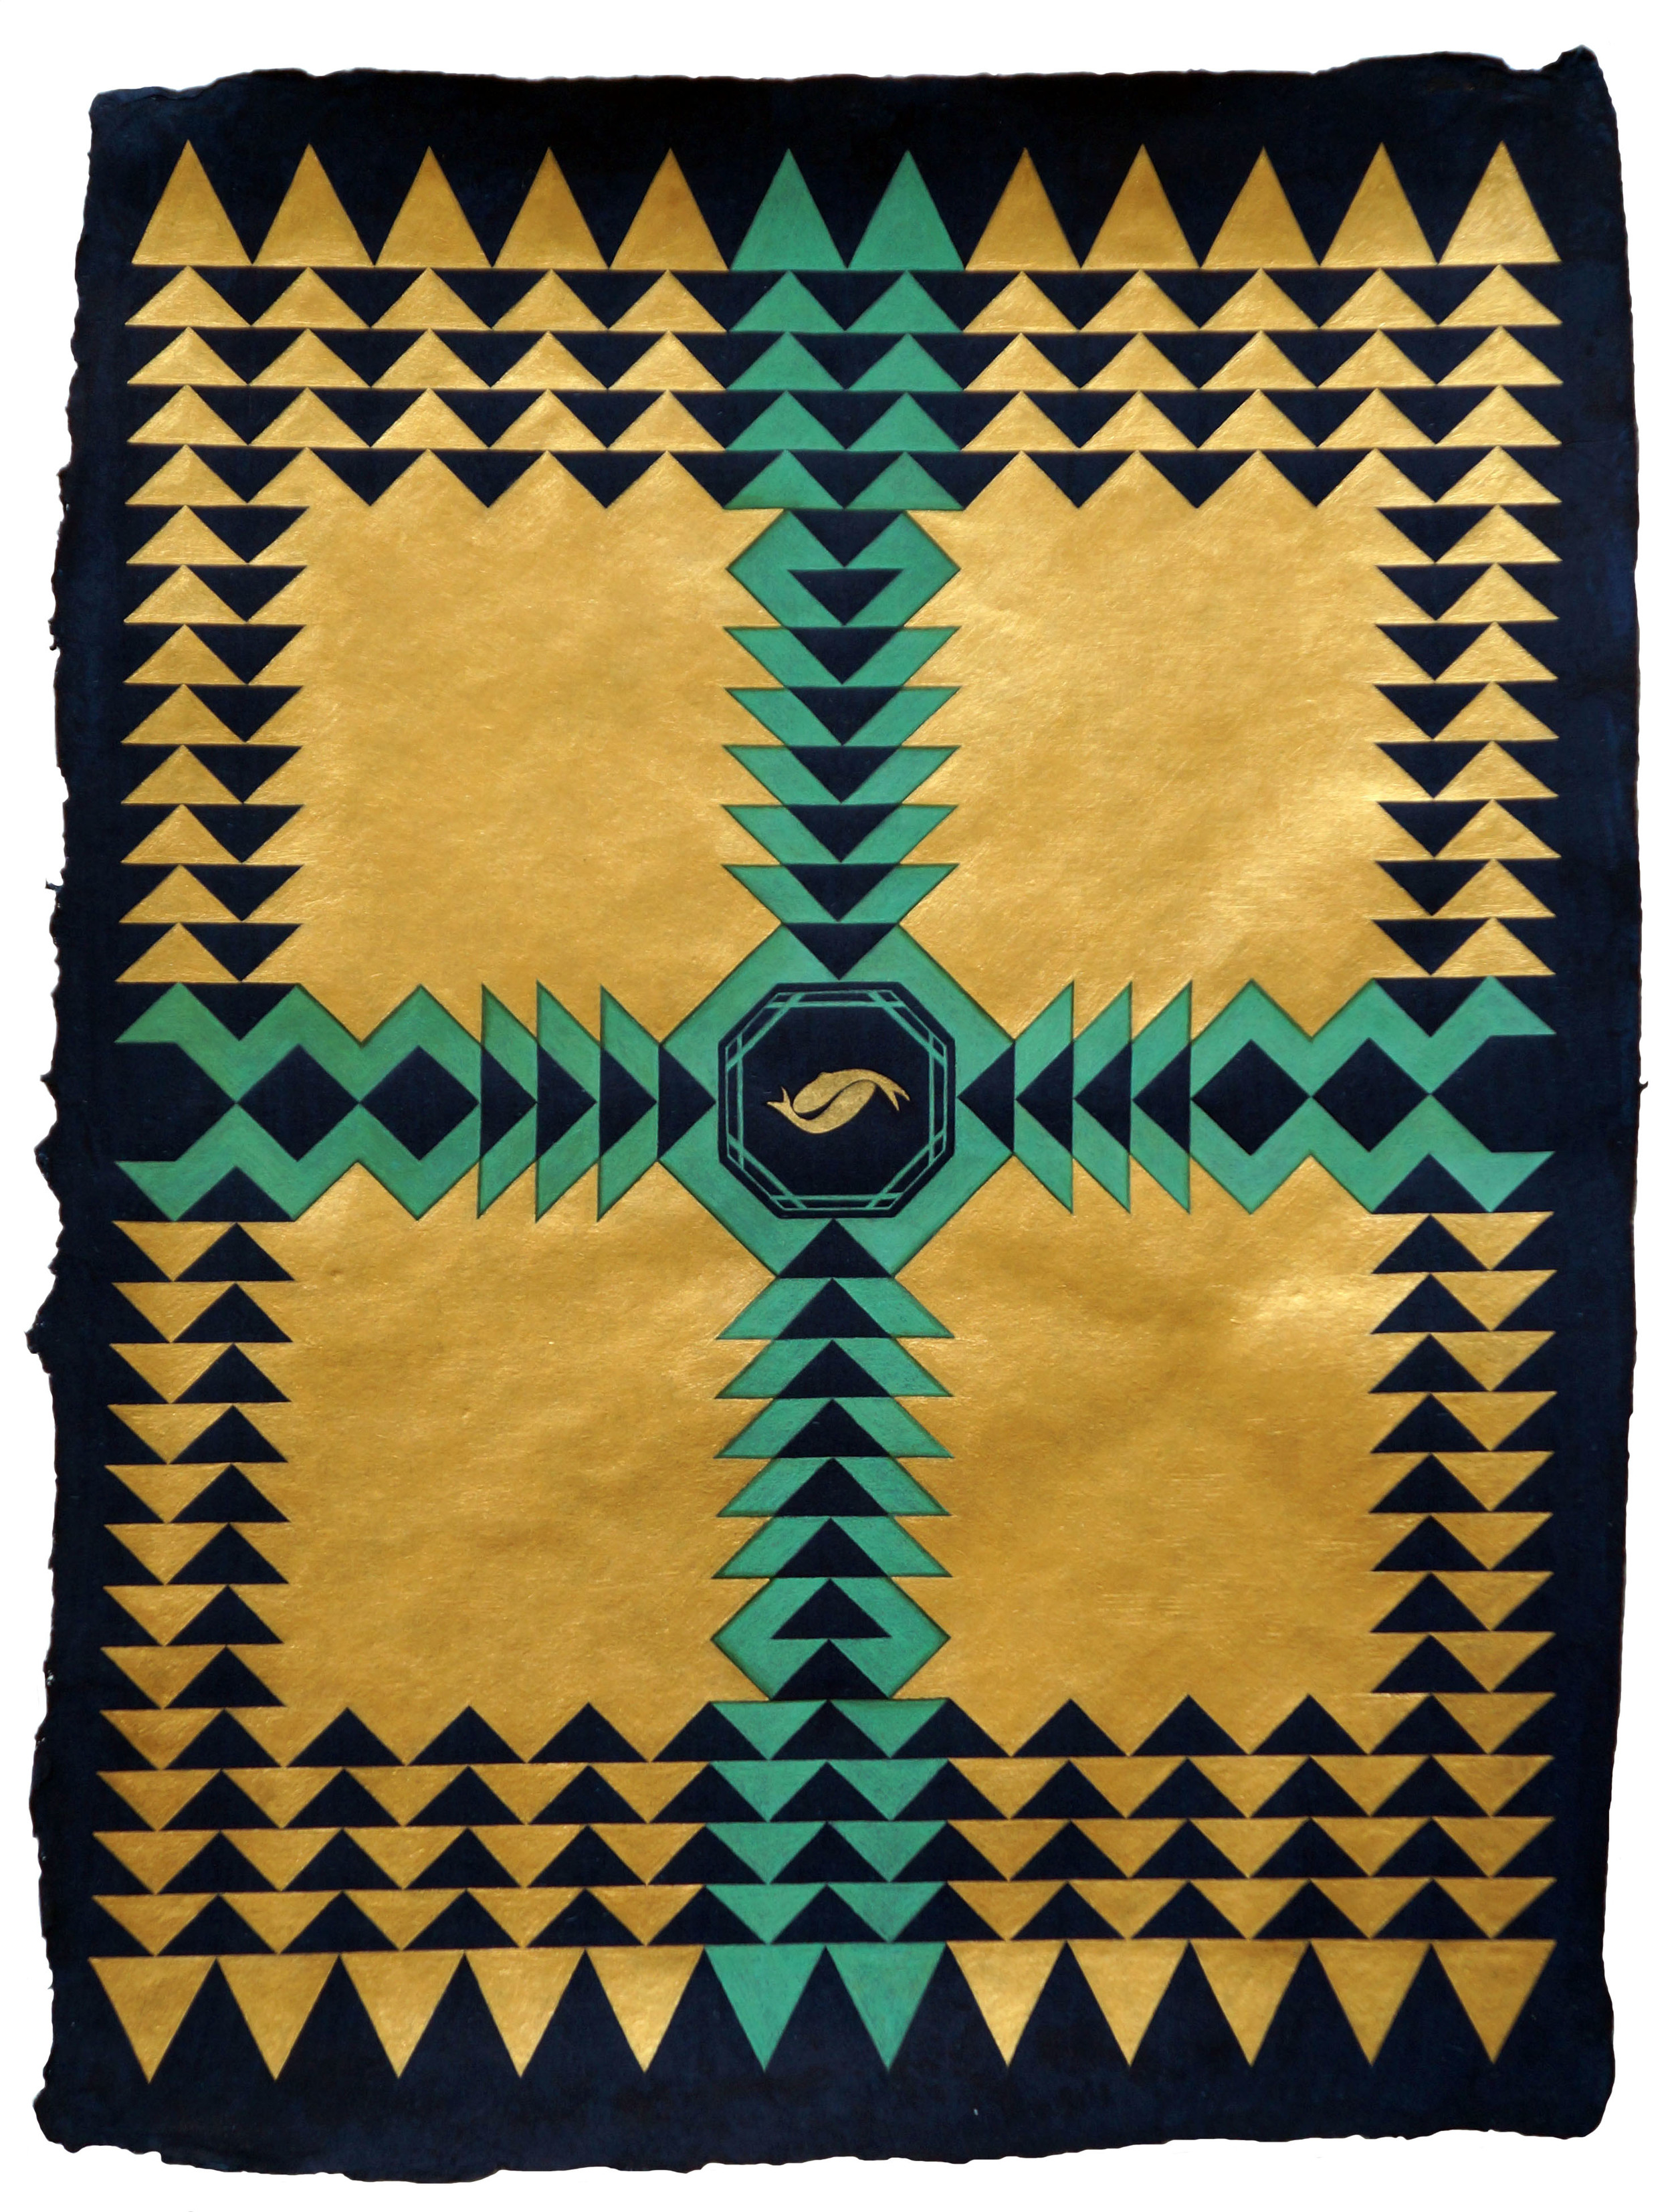 Khizrnama (Fountain) , 2013  24-karat gold, malachite and acrylic on handmade indigo wasli paper  17 x 13 inches